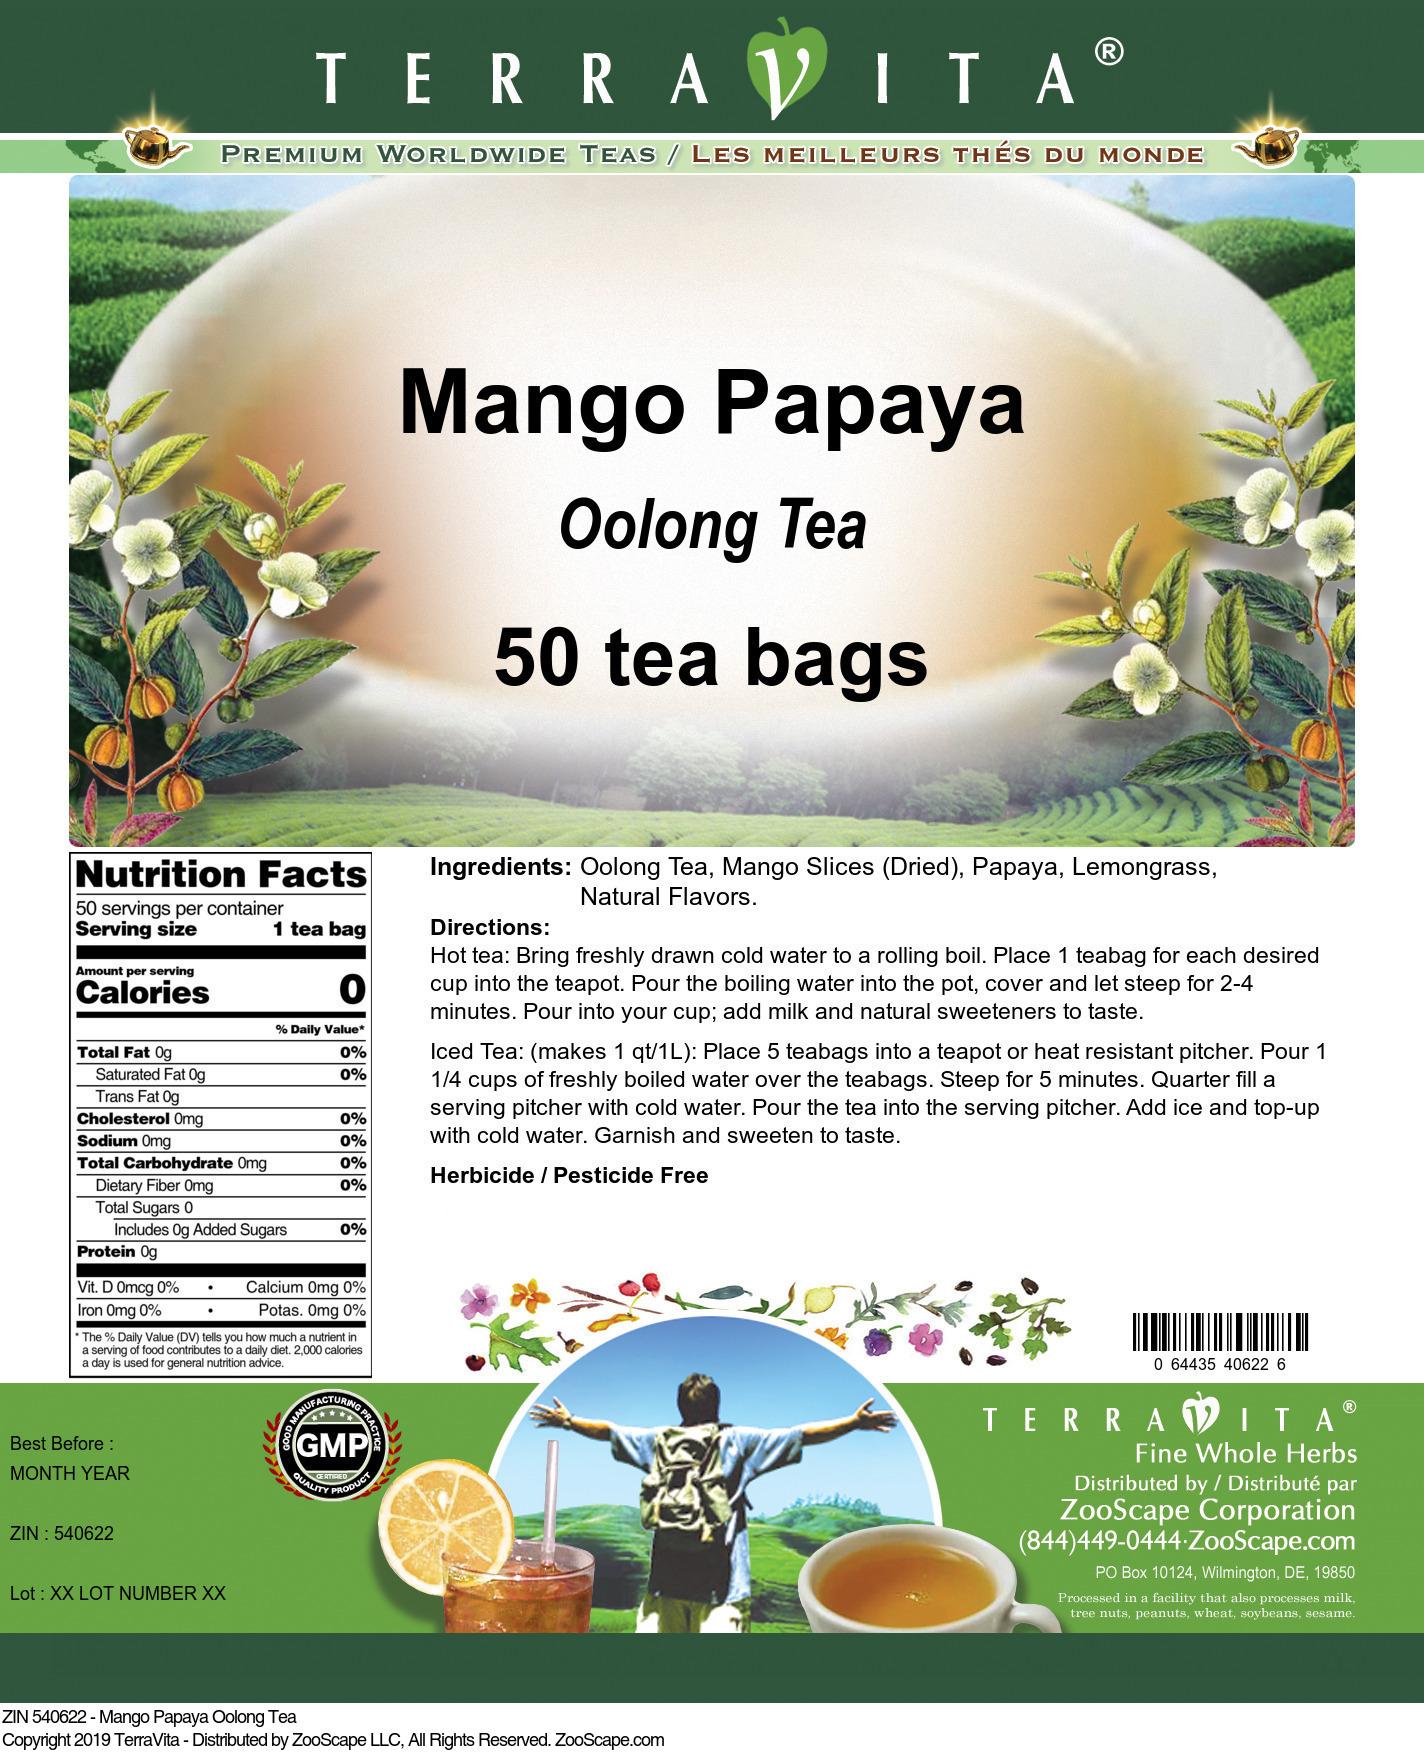 Mango Papaya Oolong Tea